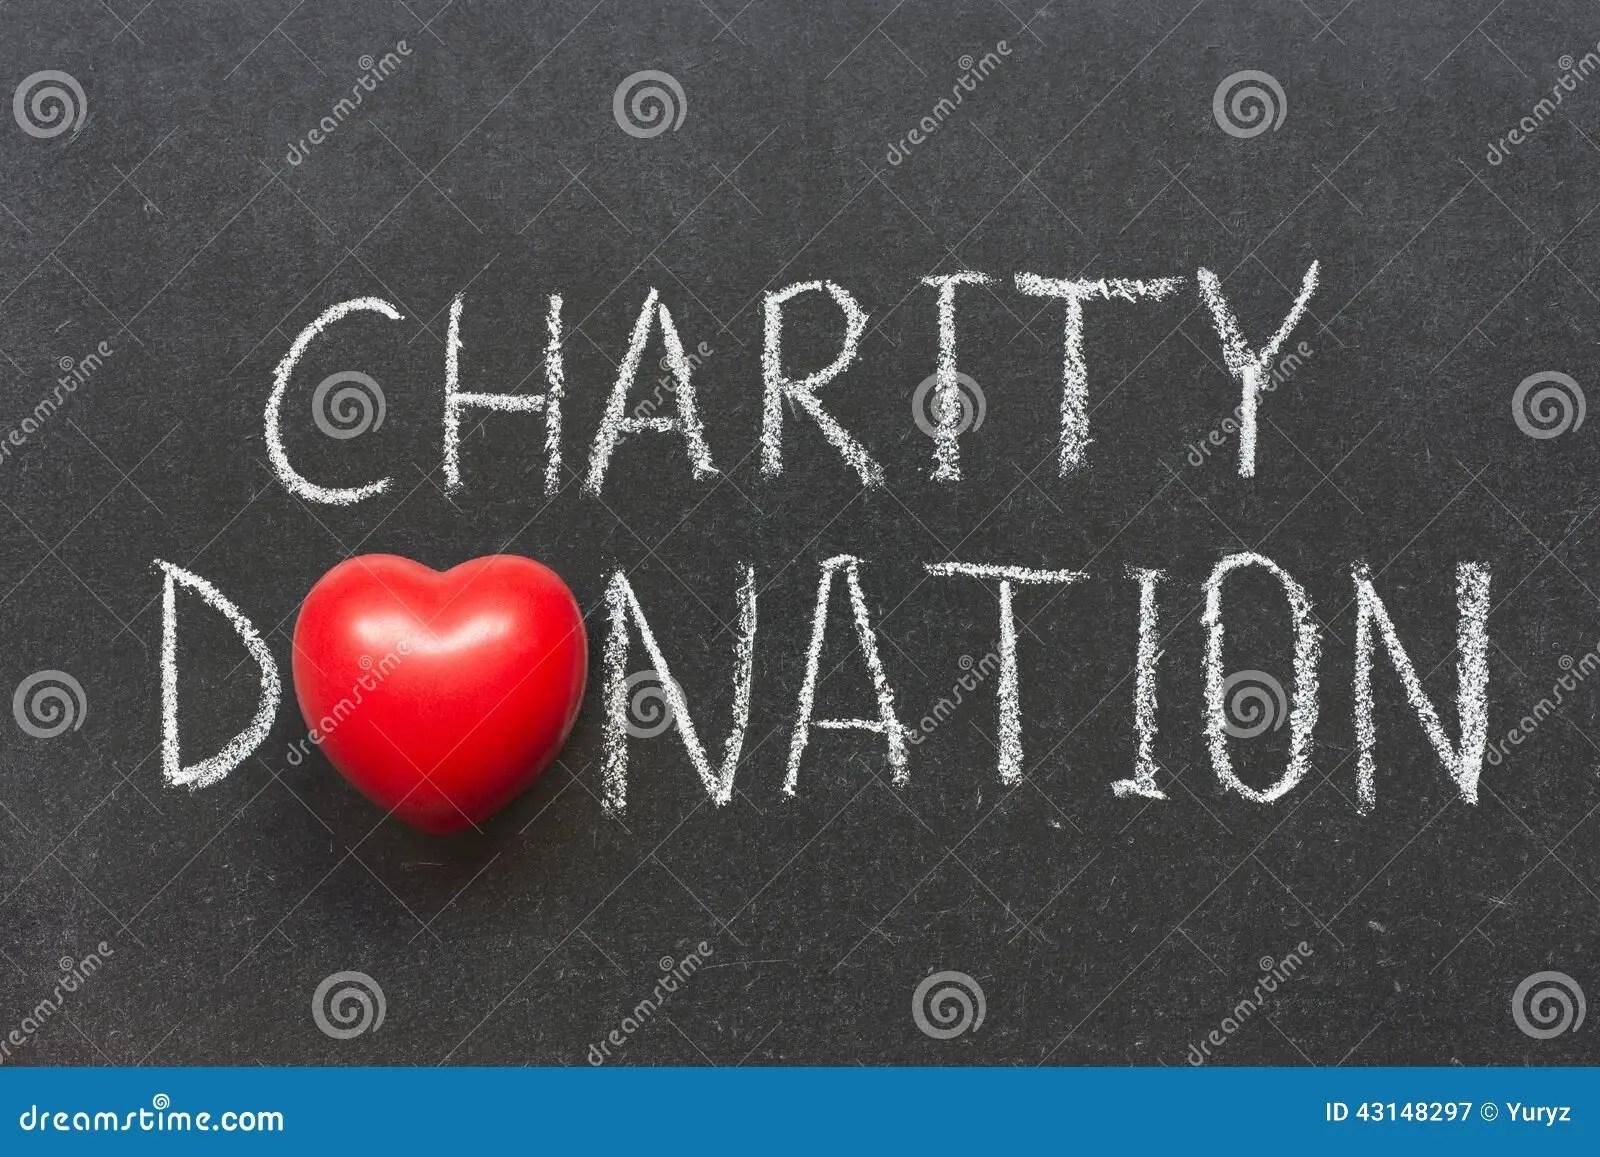 Charity Donation Stock Photo Image 43148297